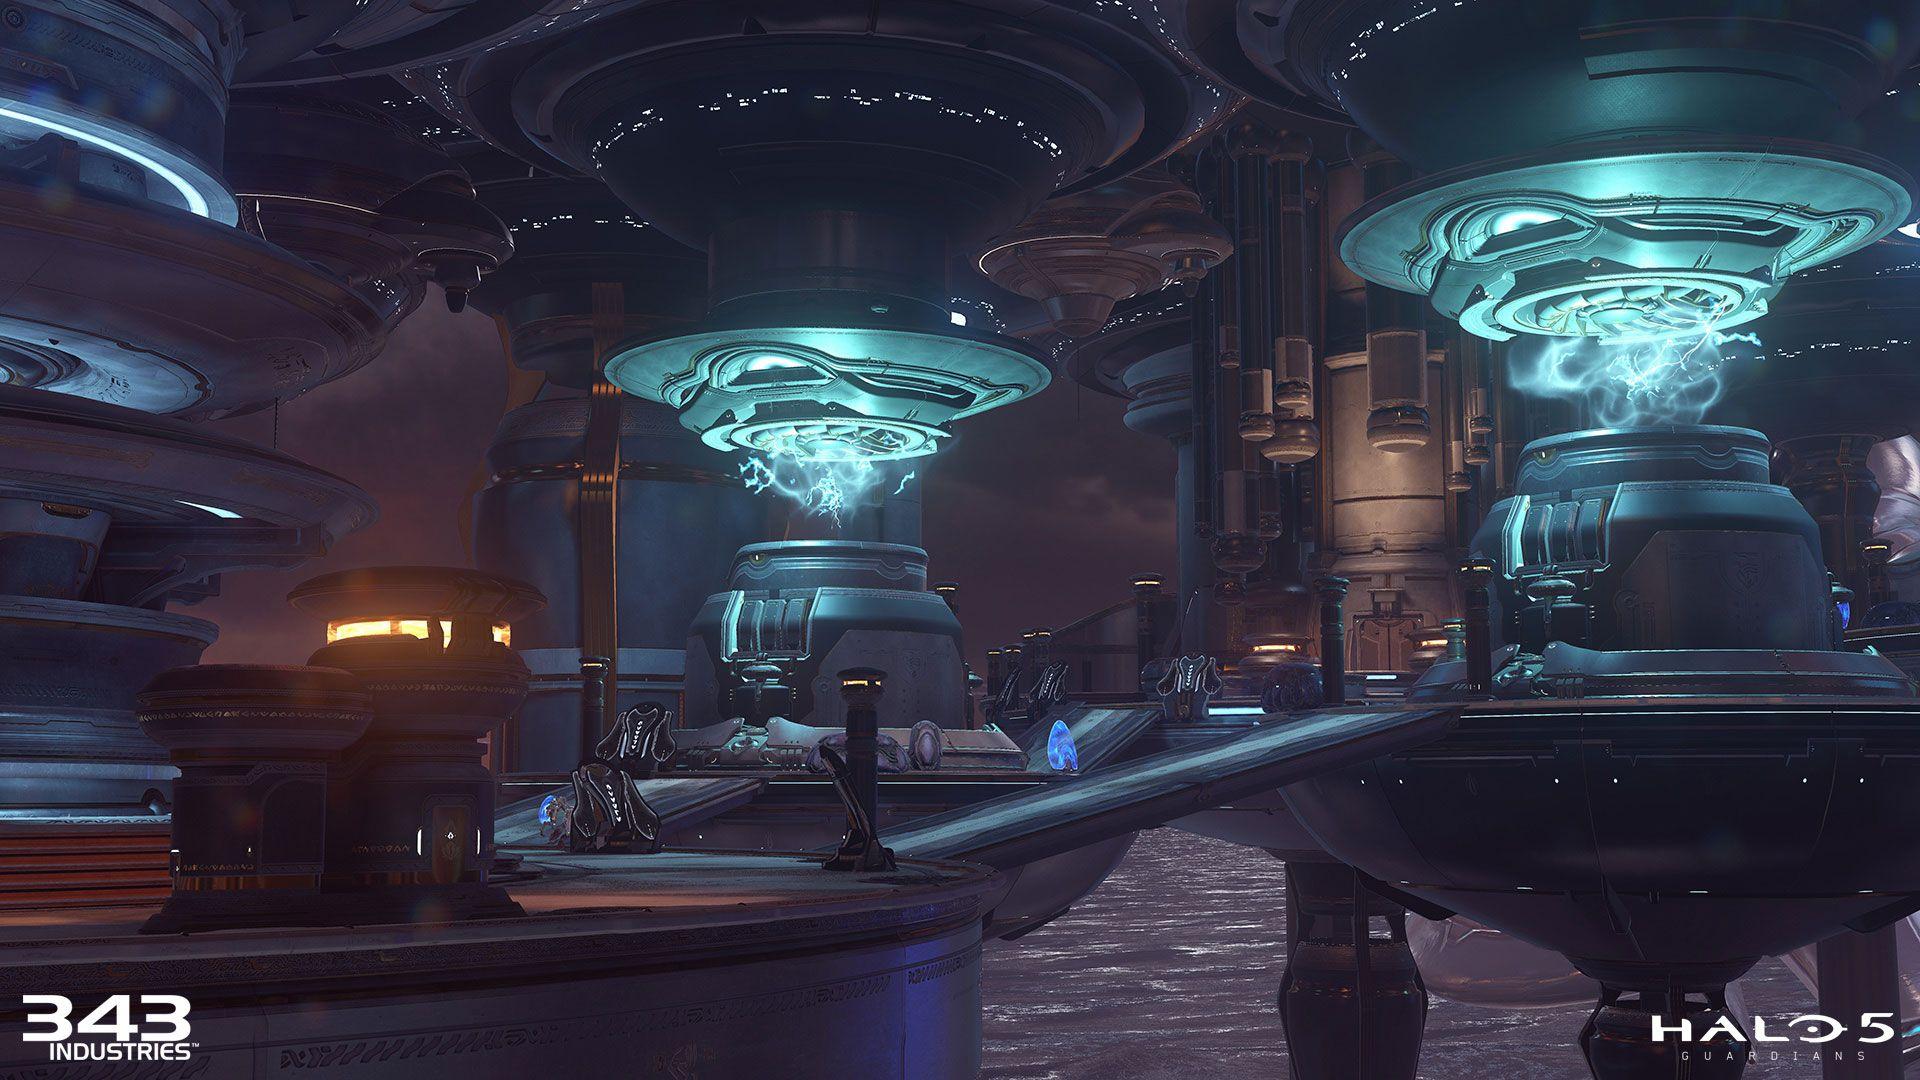 Halo 5 Art Showcase   Halo 5: Guardians   Community   Halo - Official Site